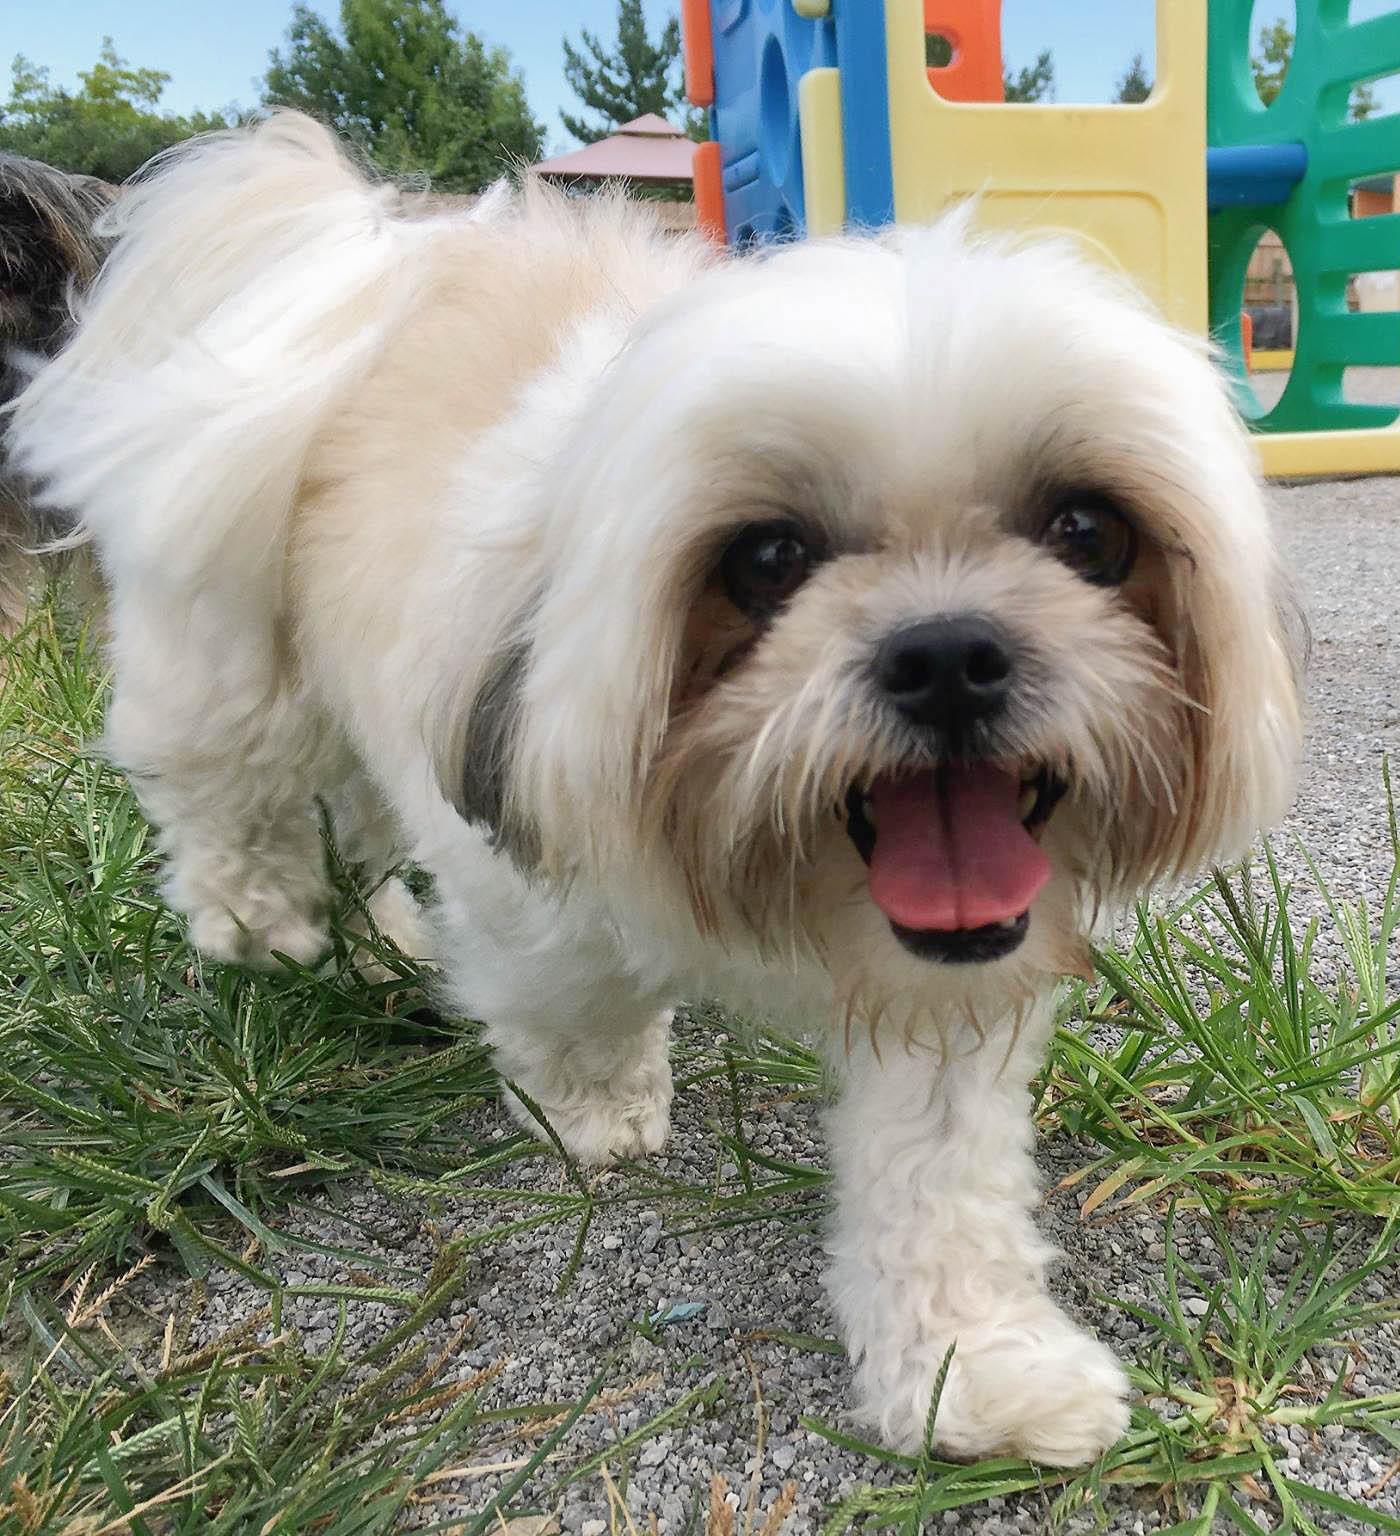 2016-dogs-31_35264352220_o.jpg